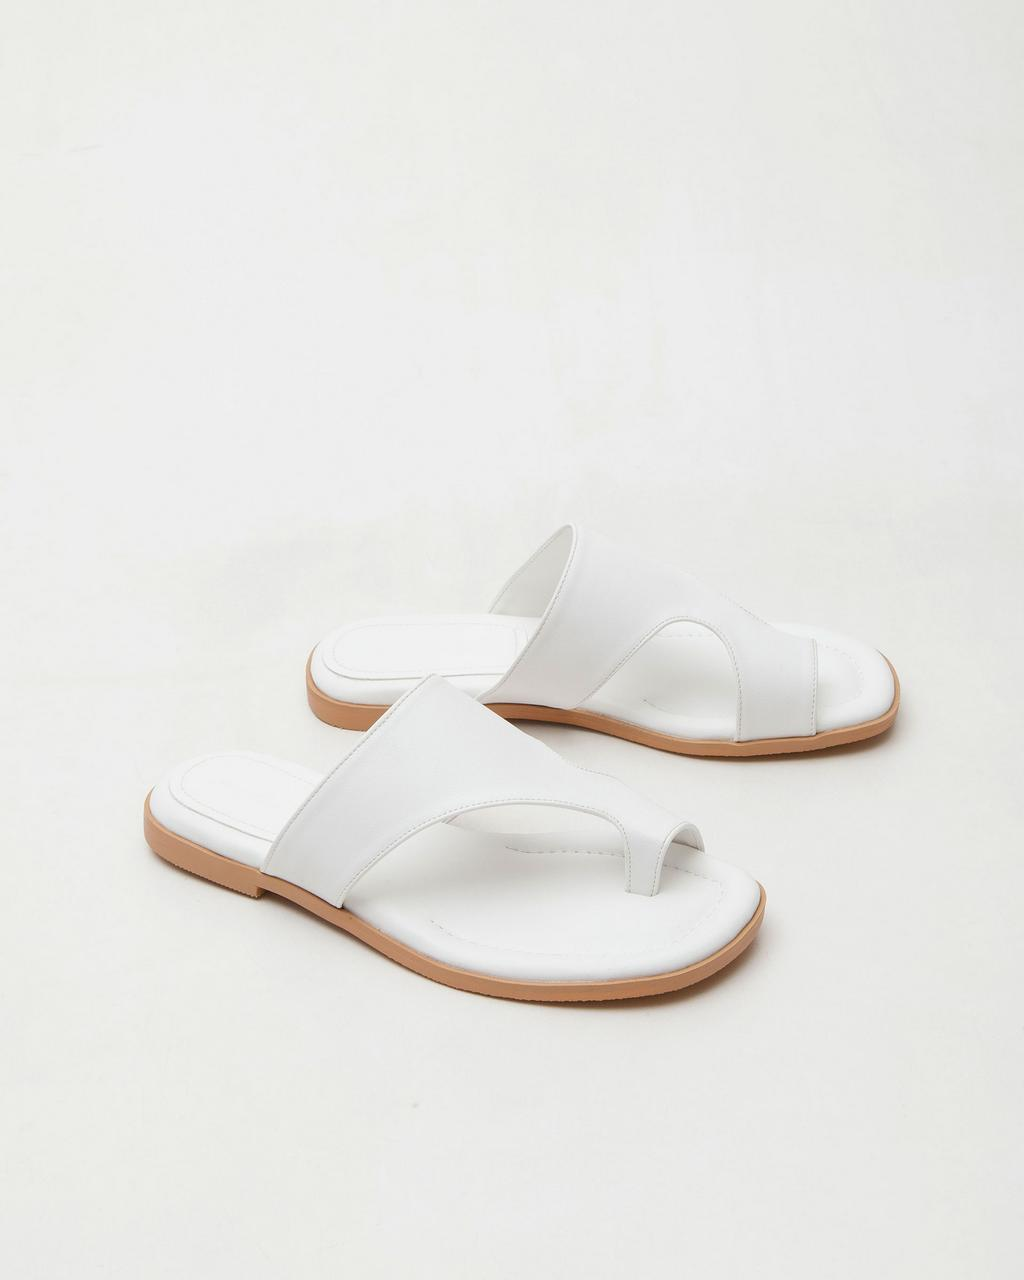 Tagtraume Mali - White(화이트)